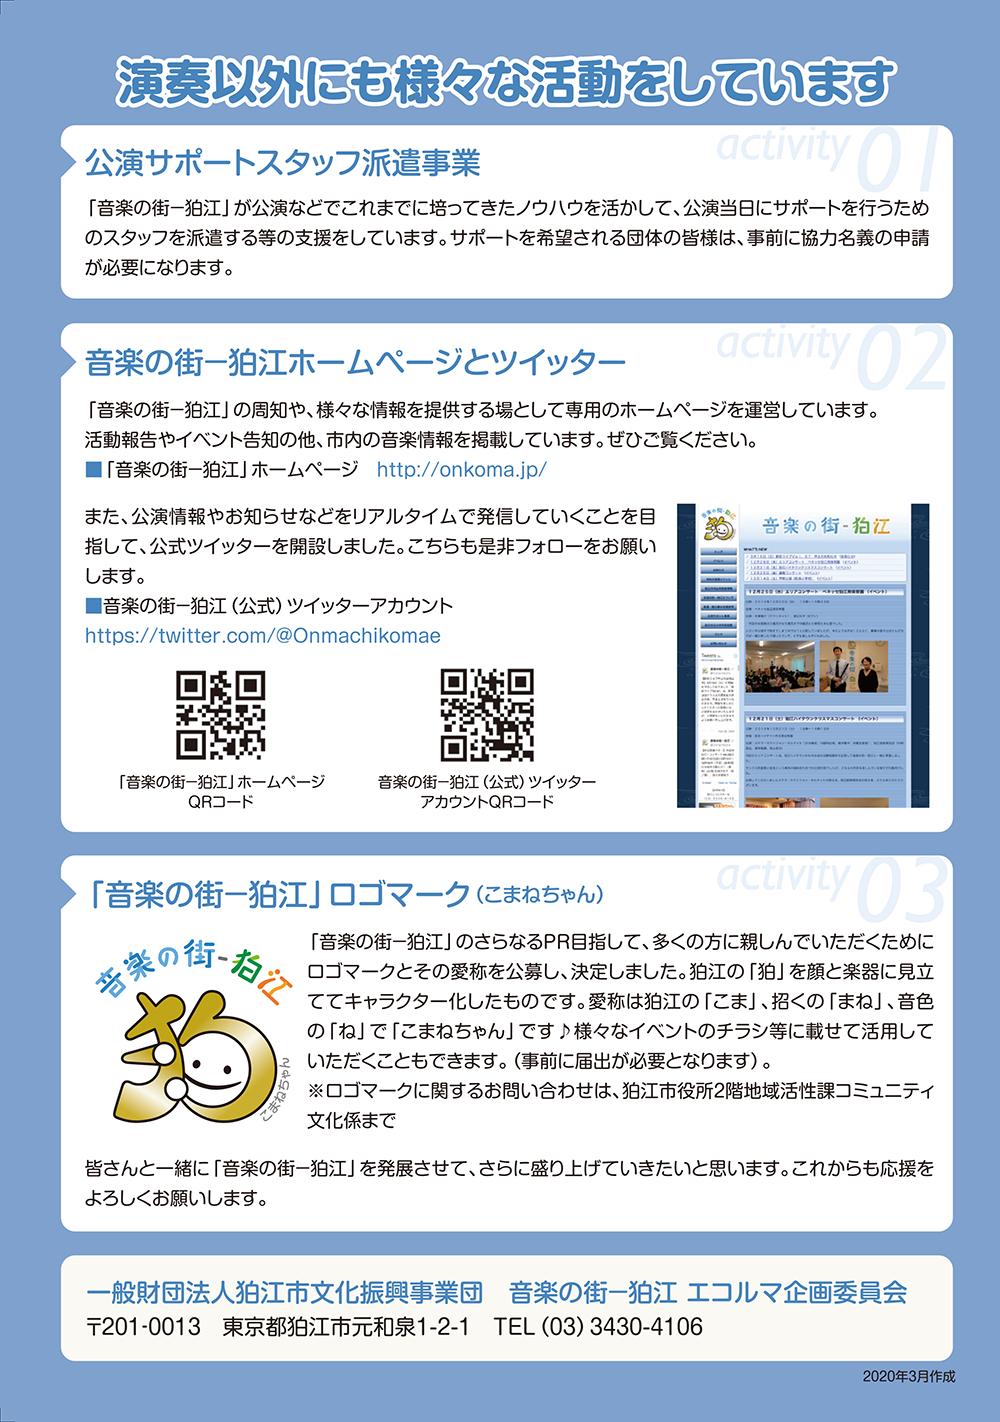 http://onkoma.jp/manual_04.png